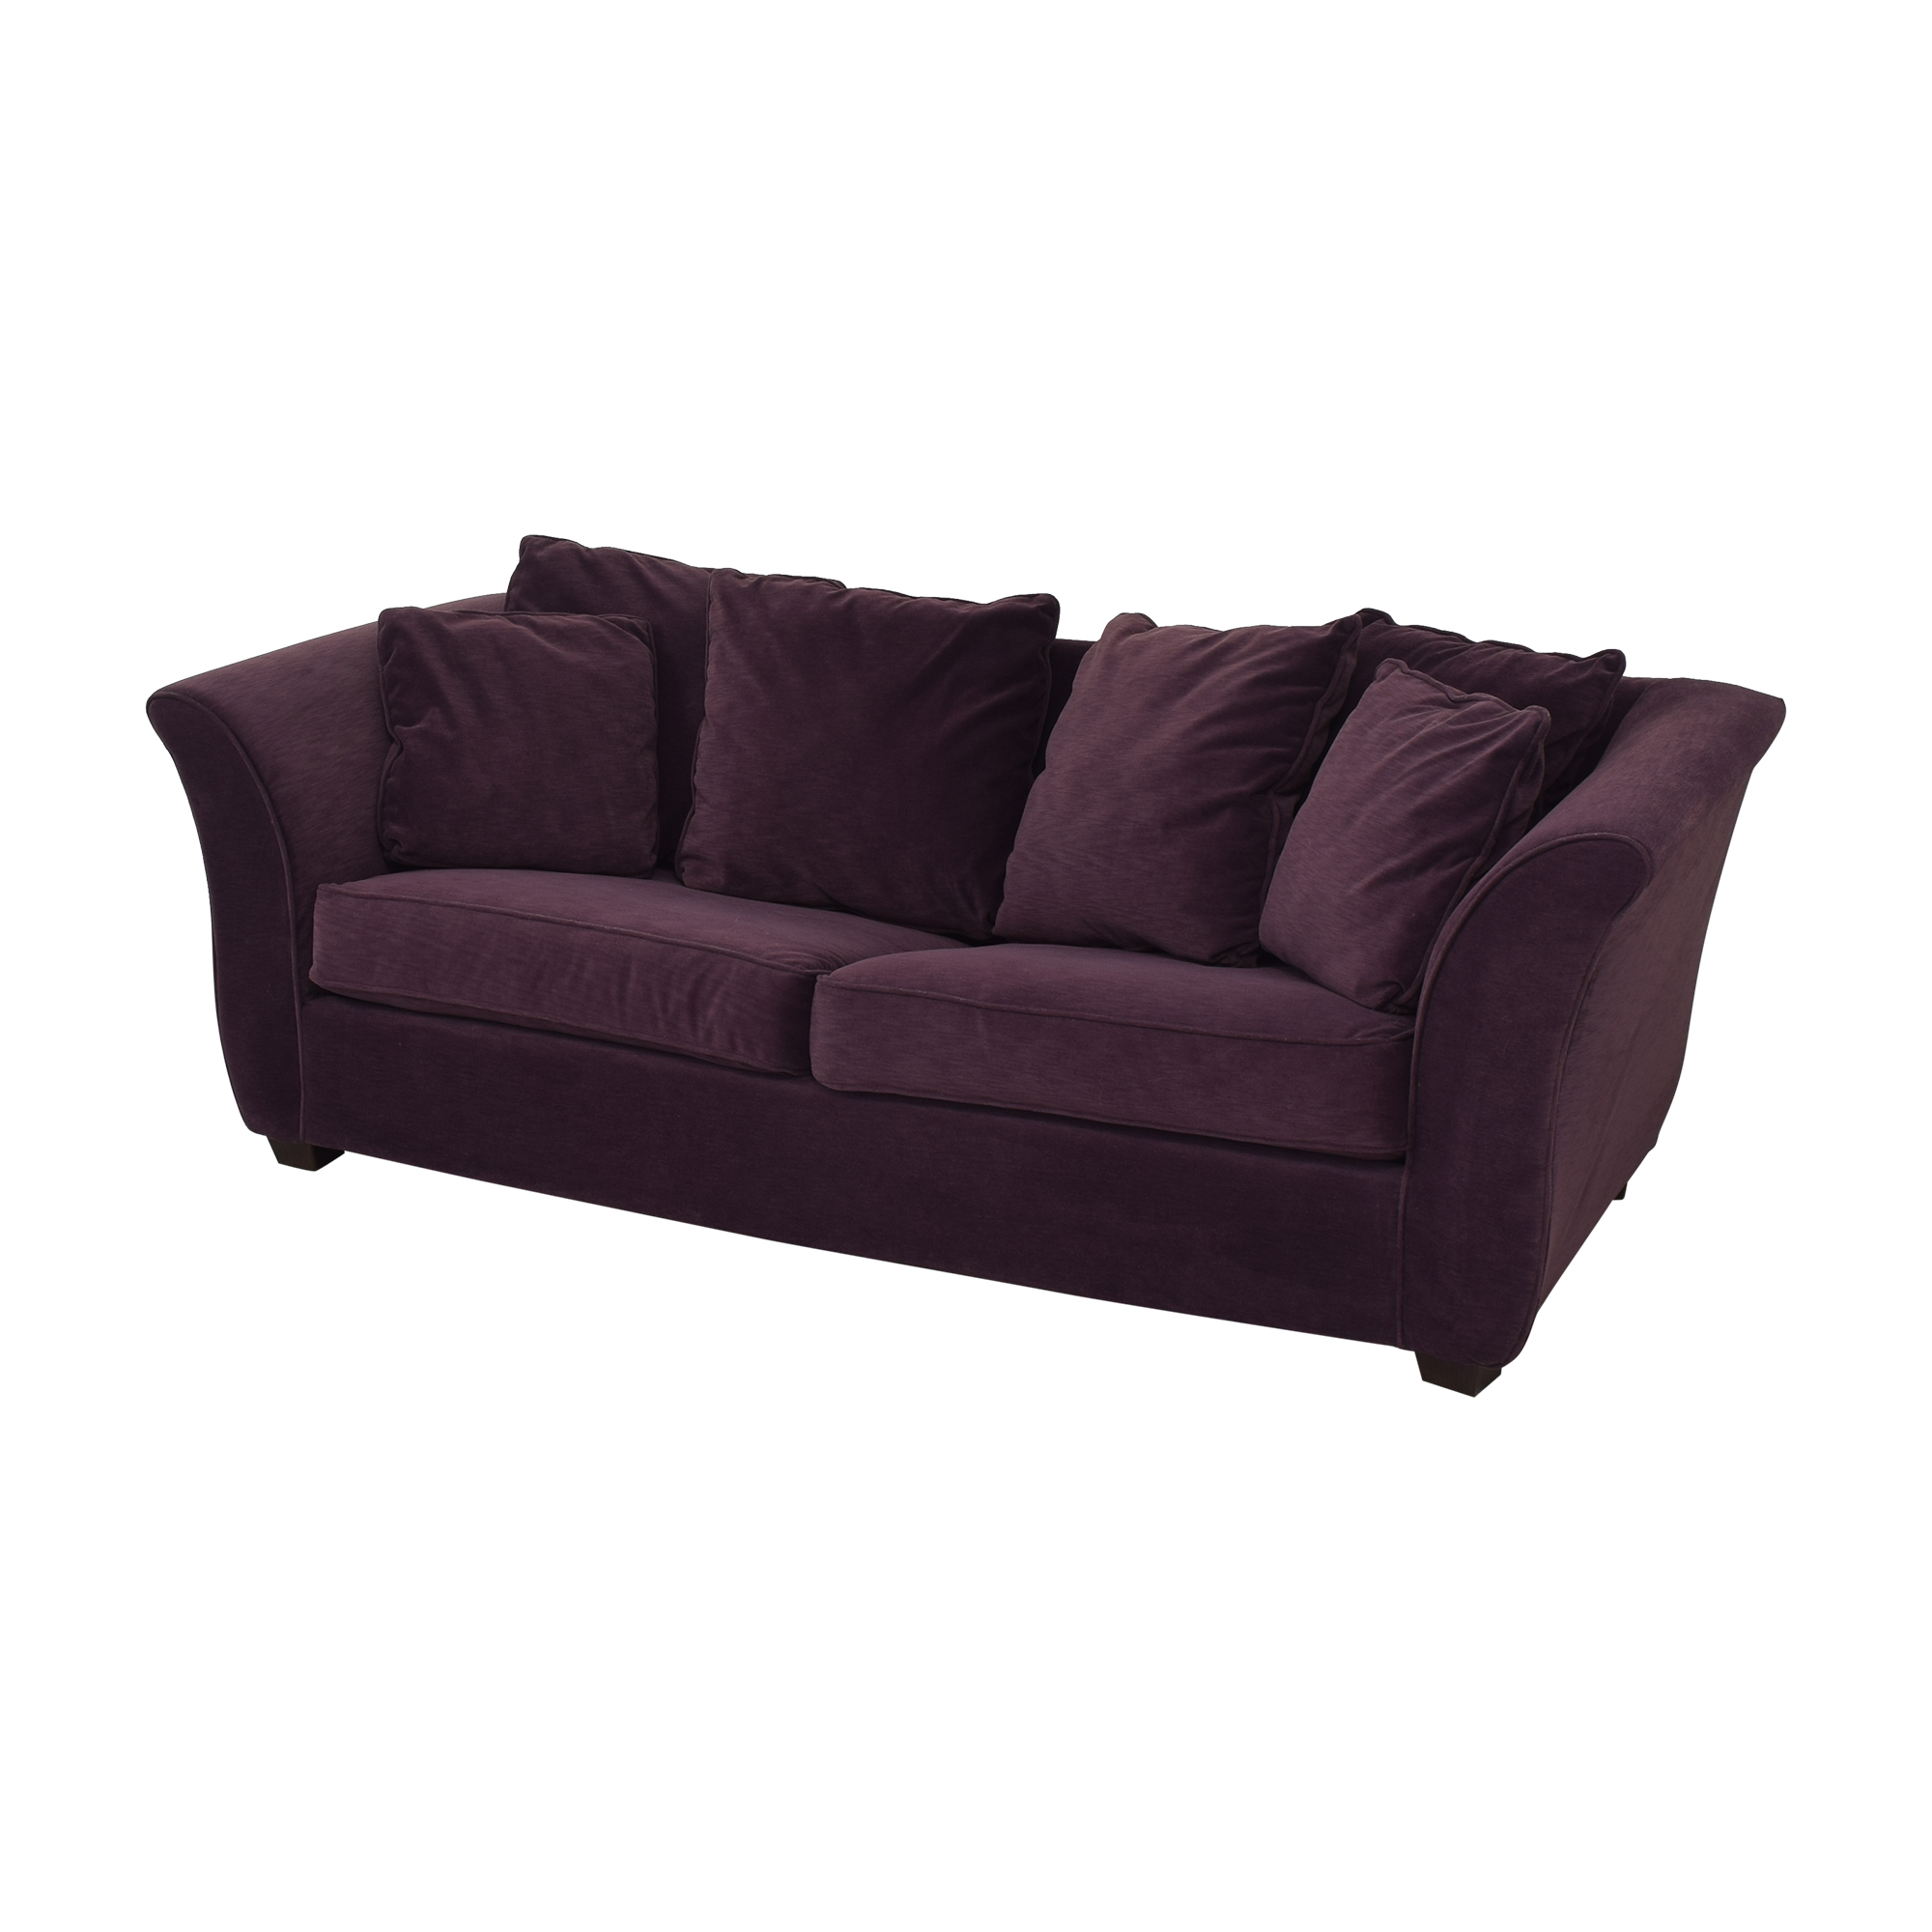 Taylor Made Furniture Taylor Made Sleeper Sofa nj